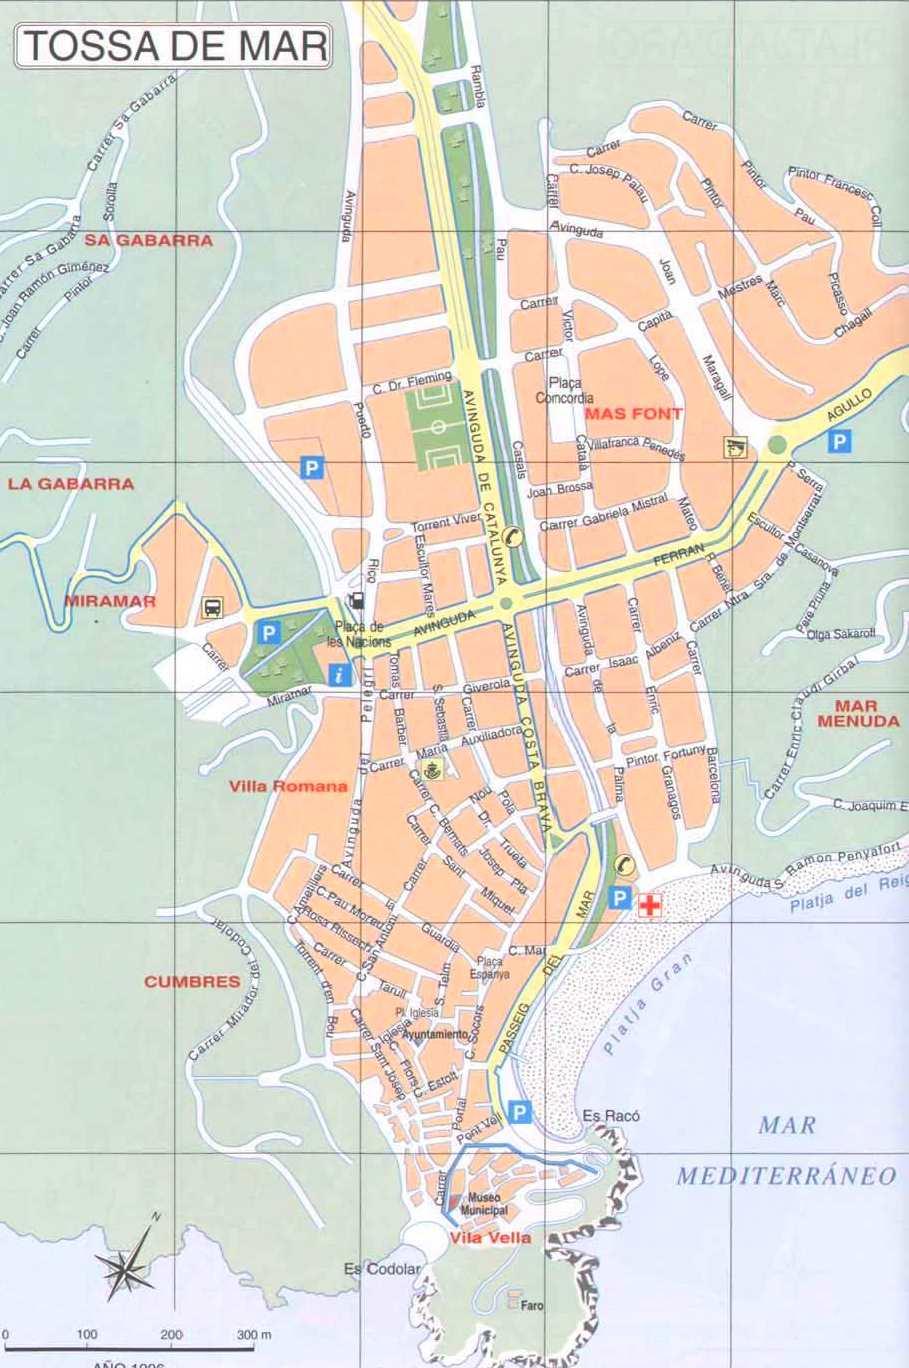 Cartina Jerez De La Frontera.Mappa Di Tossa De Mar Cartina Di Tossa De Mar